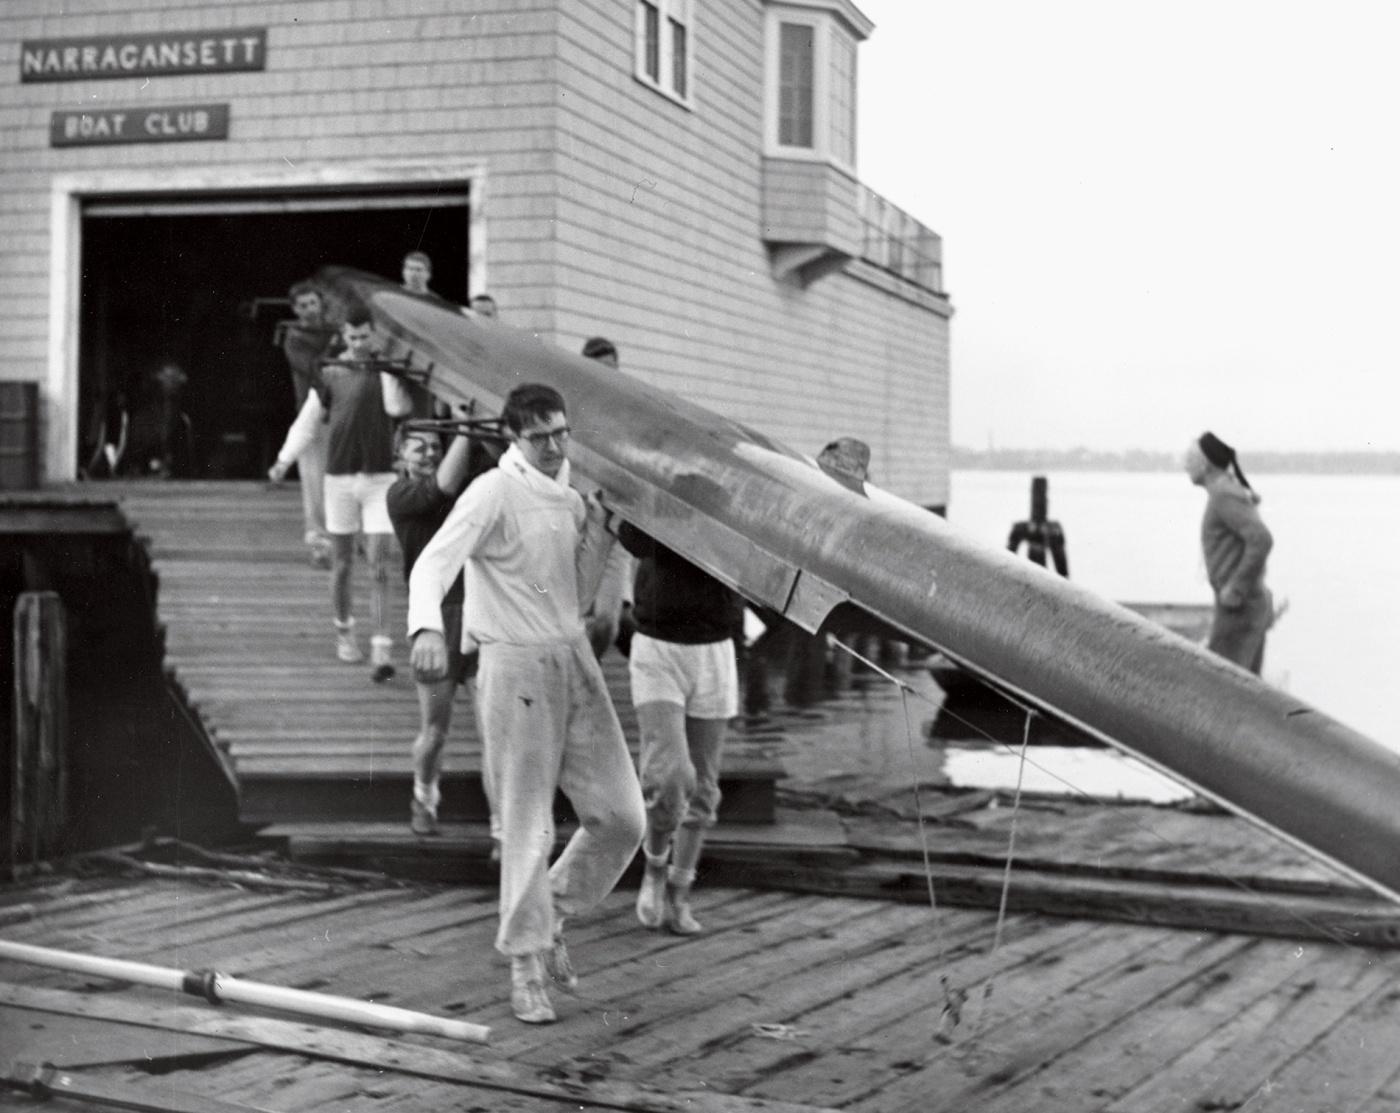 Rowing team in 1961 on Narragansett Dock